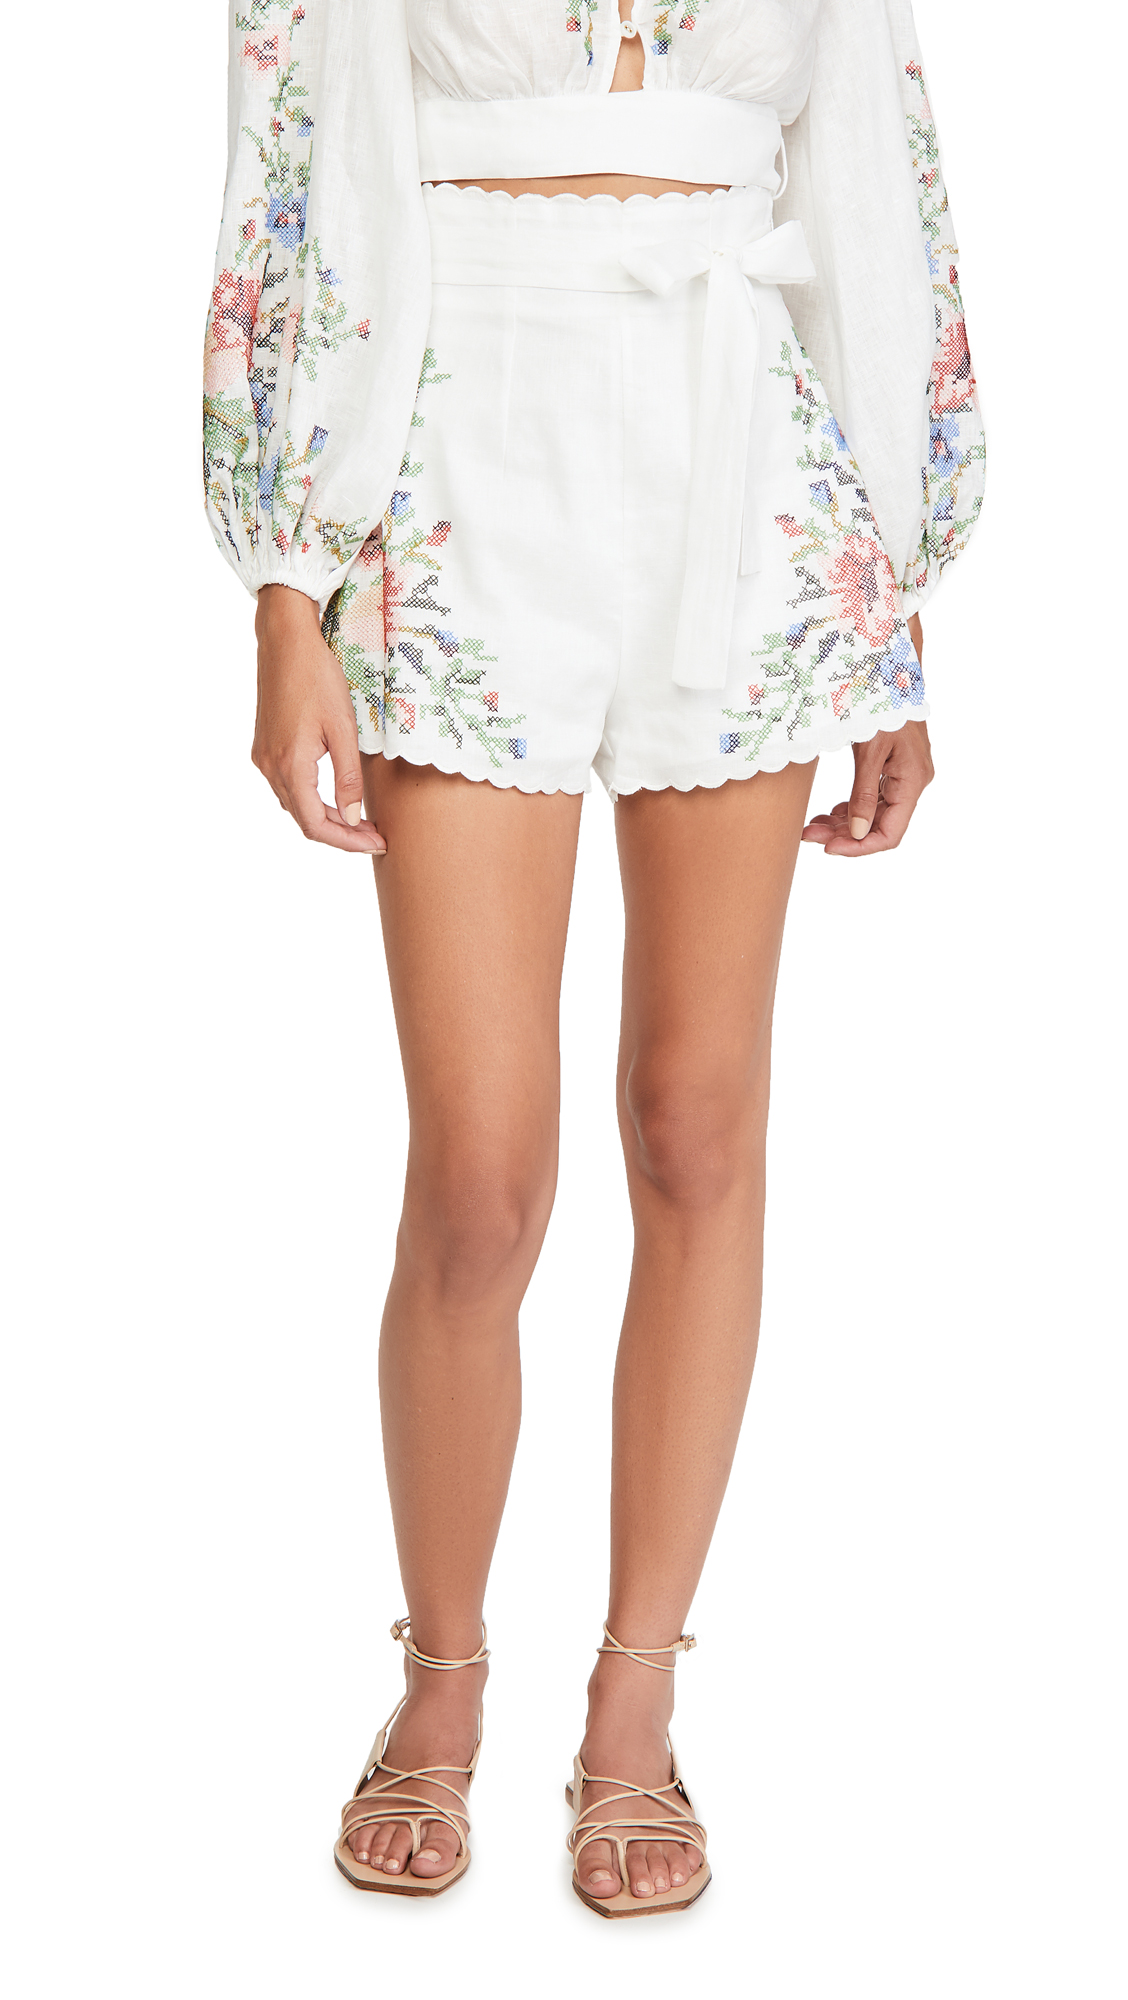 Zimmermann Juliette Cross Stitch Shorts